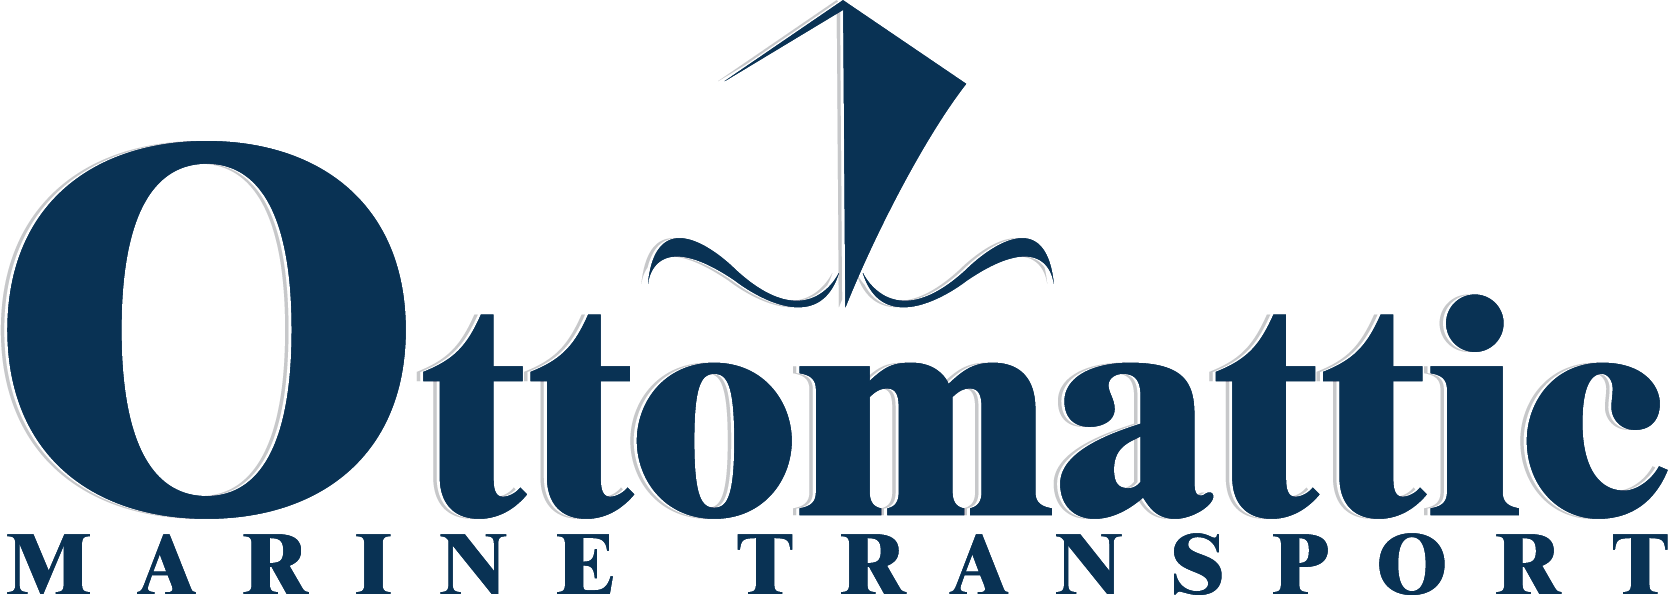 Ottomattic Marine Transport